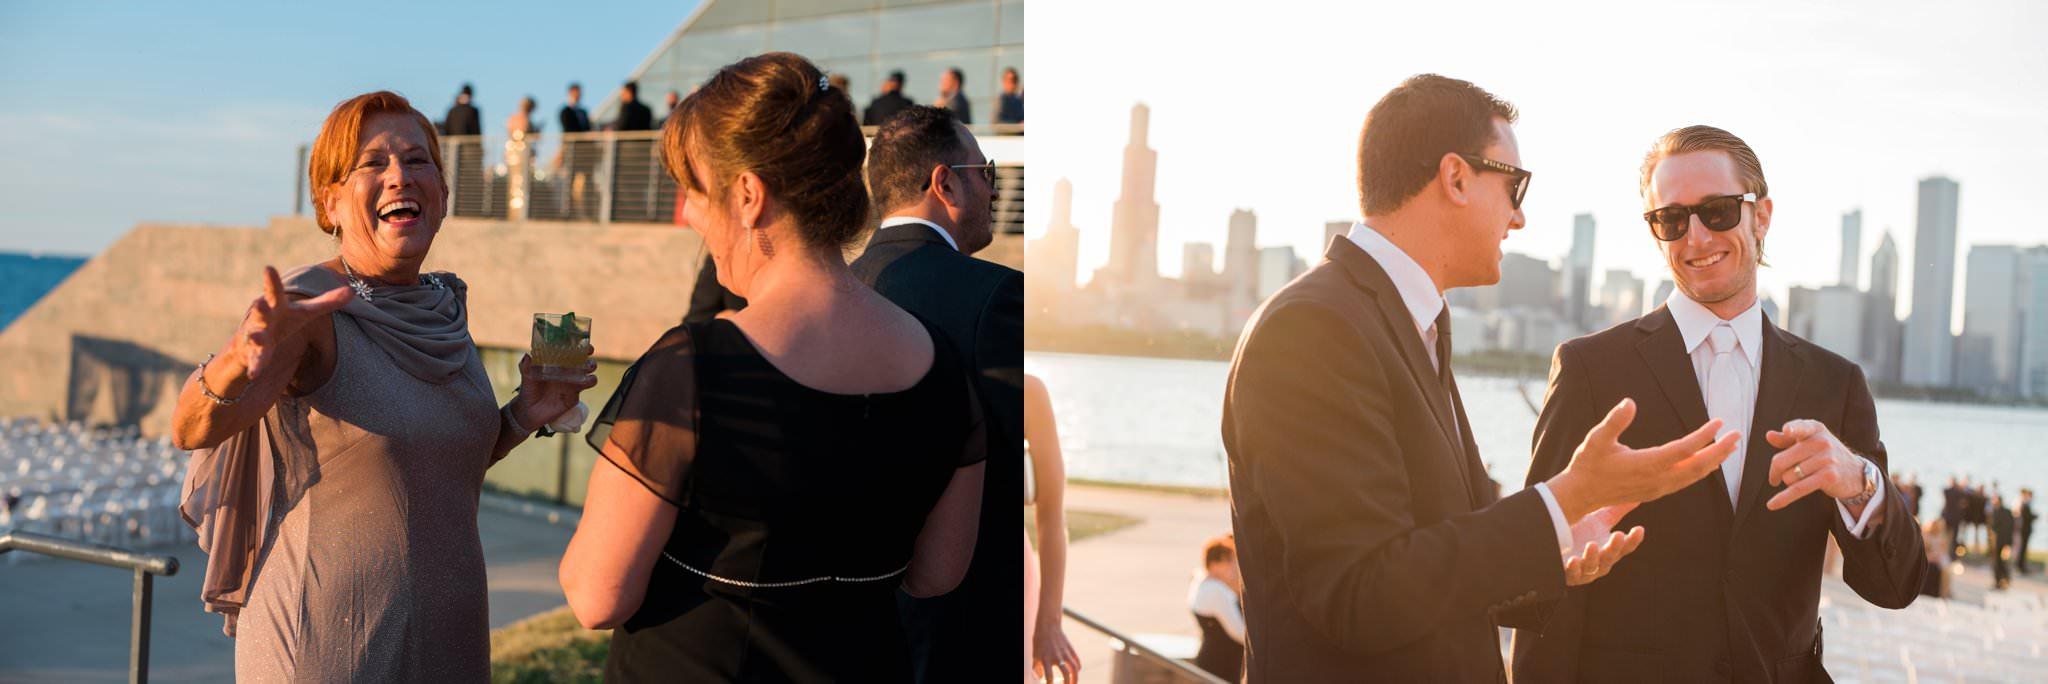 Adler-Planetarium-Chicago-Wedding-Photography-0073.JPG